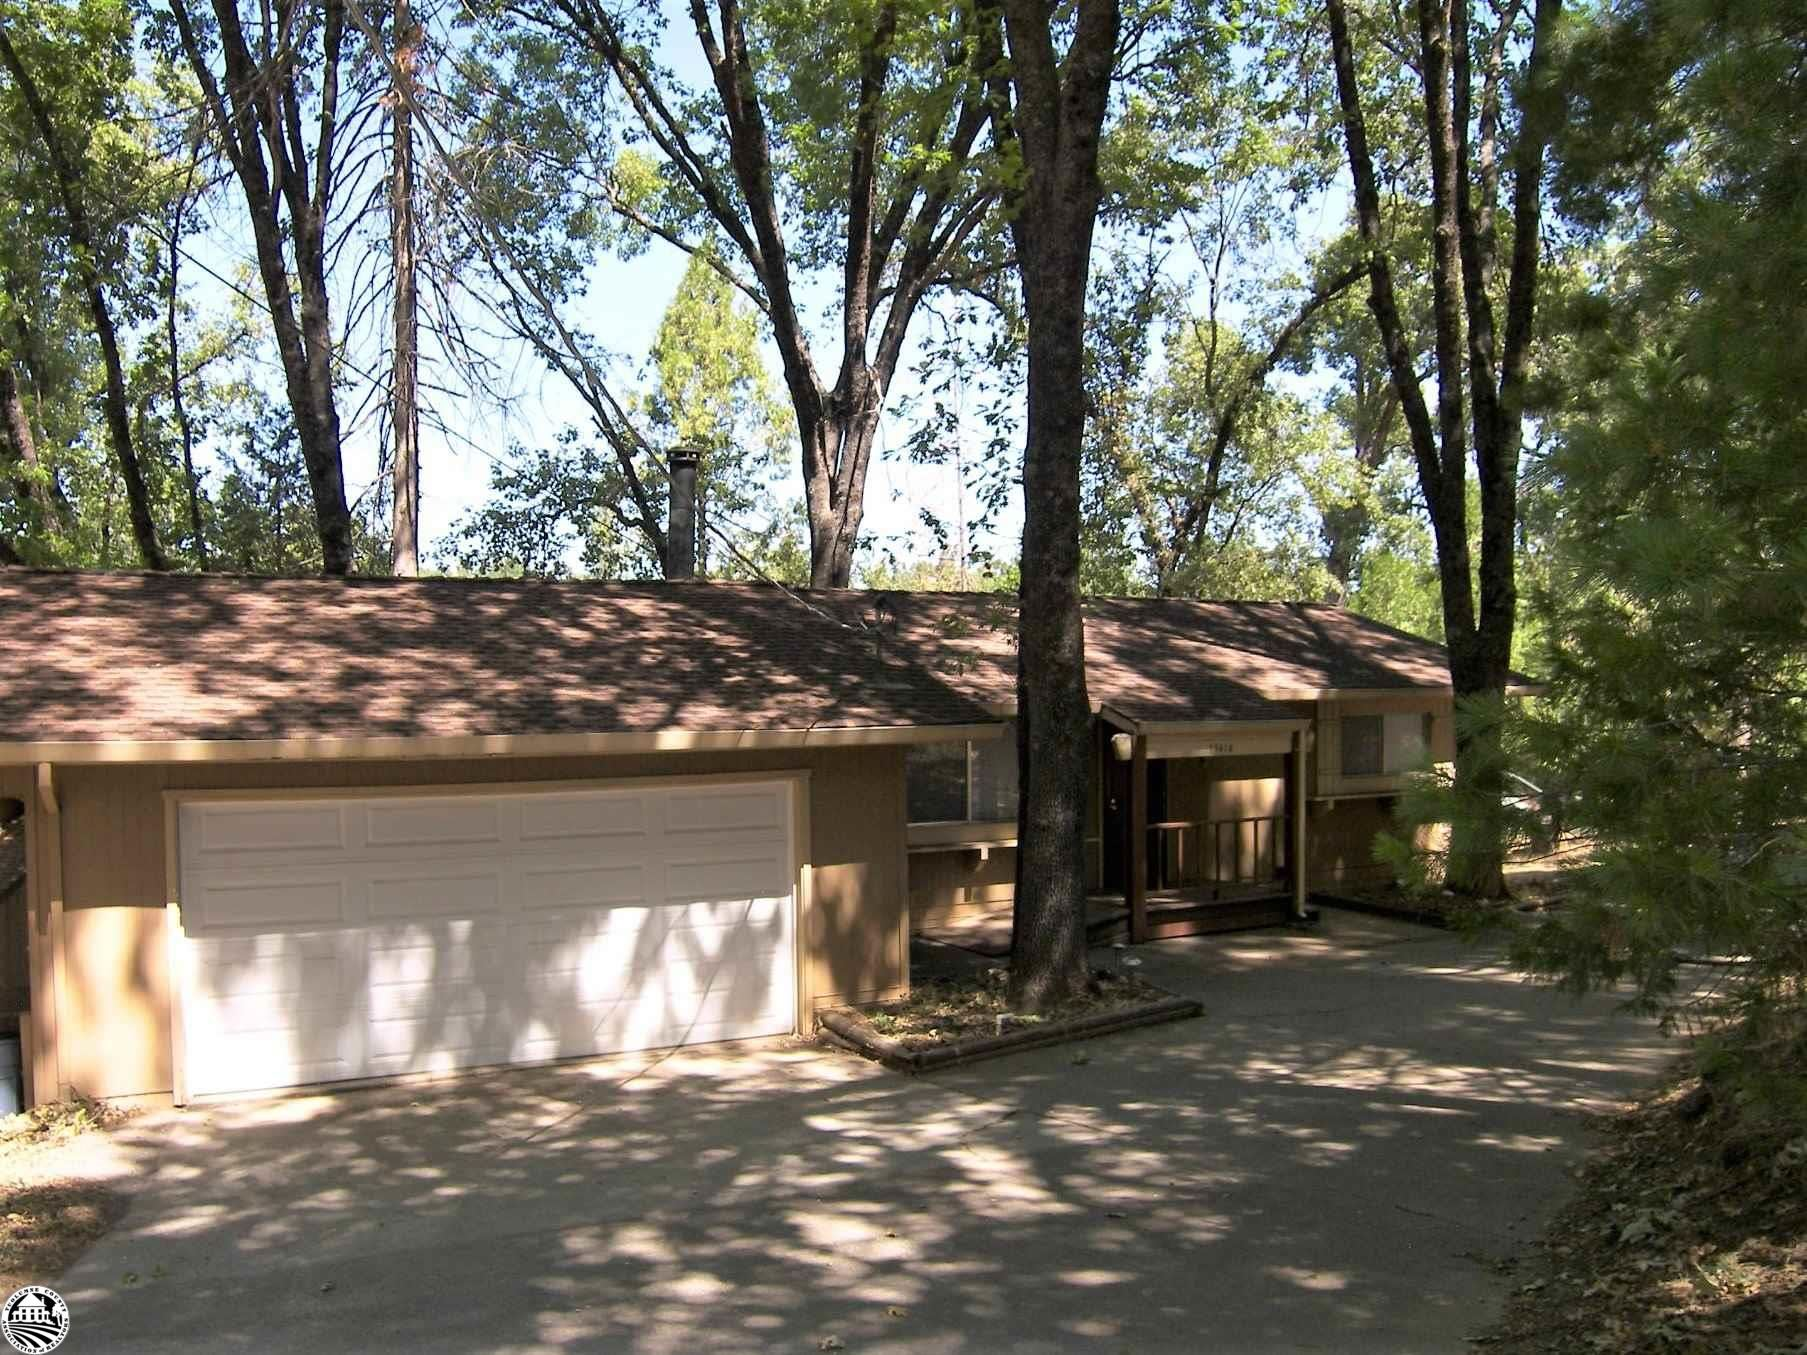 19414 Pine Mountain Drive Drive #369, Groveland, CA 95321 - #: 20191715